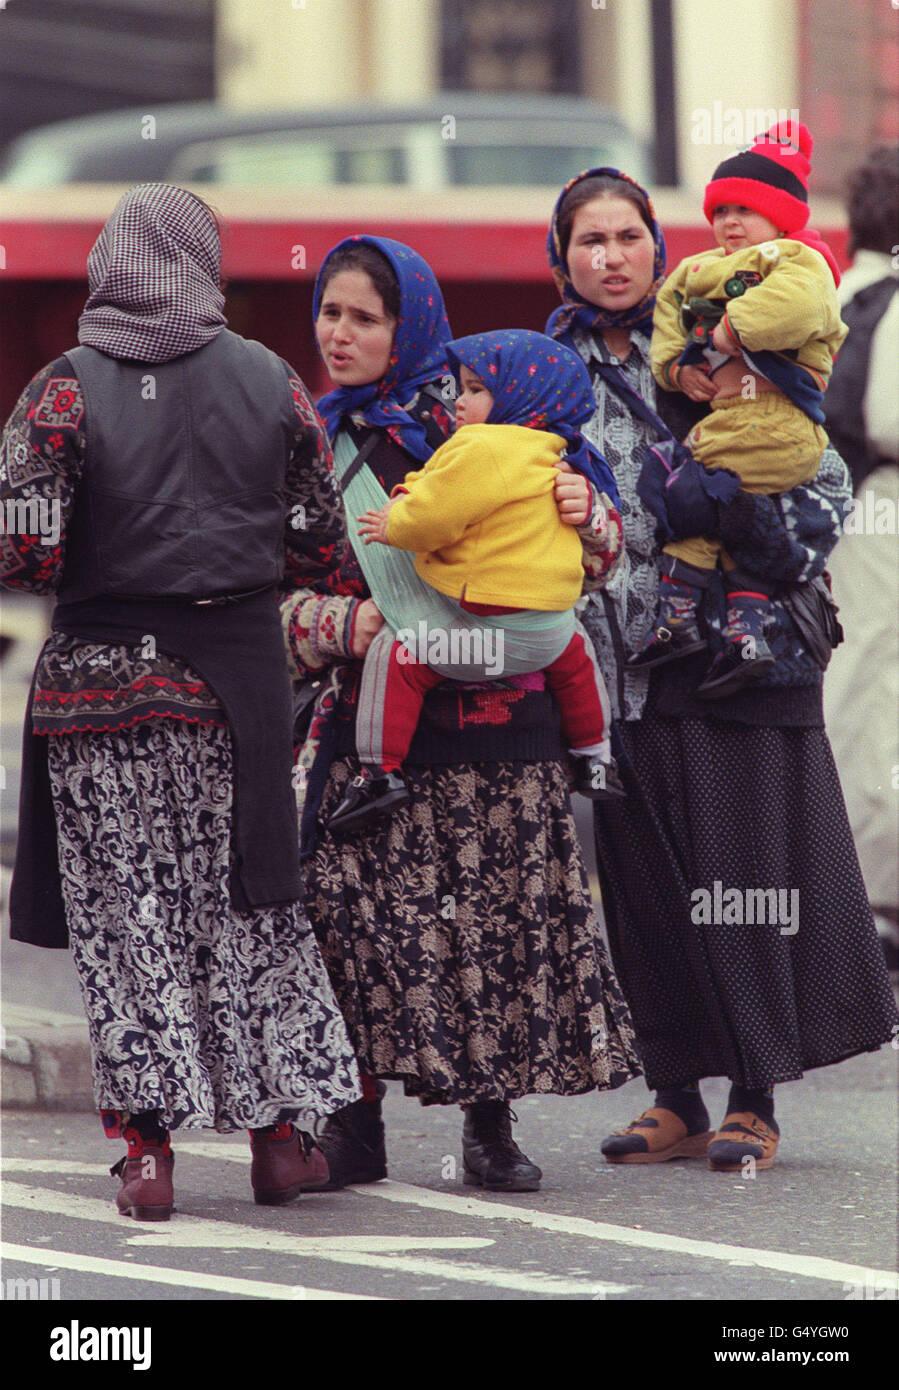 Romanian women in London Stock Photo, Royalty Free Image